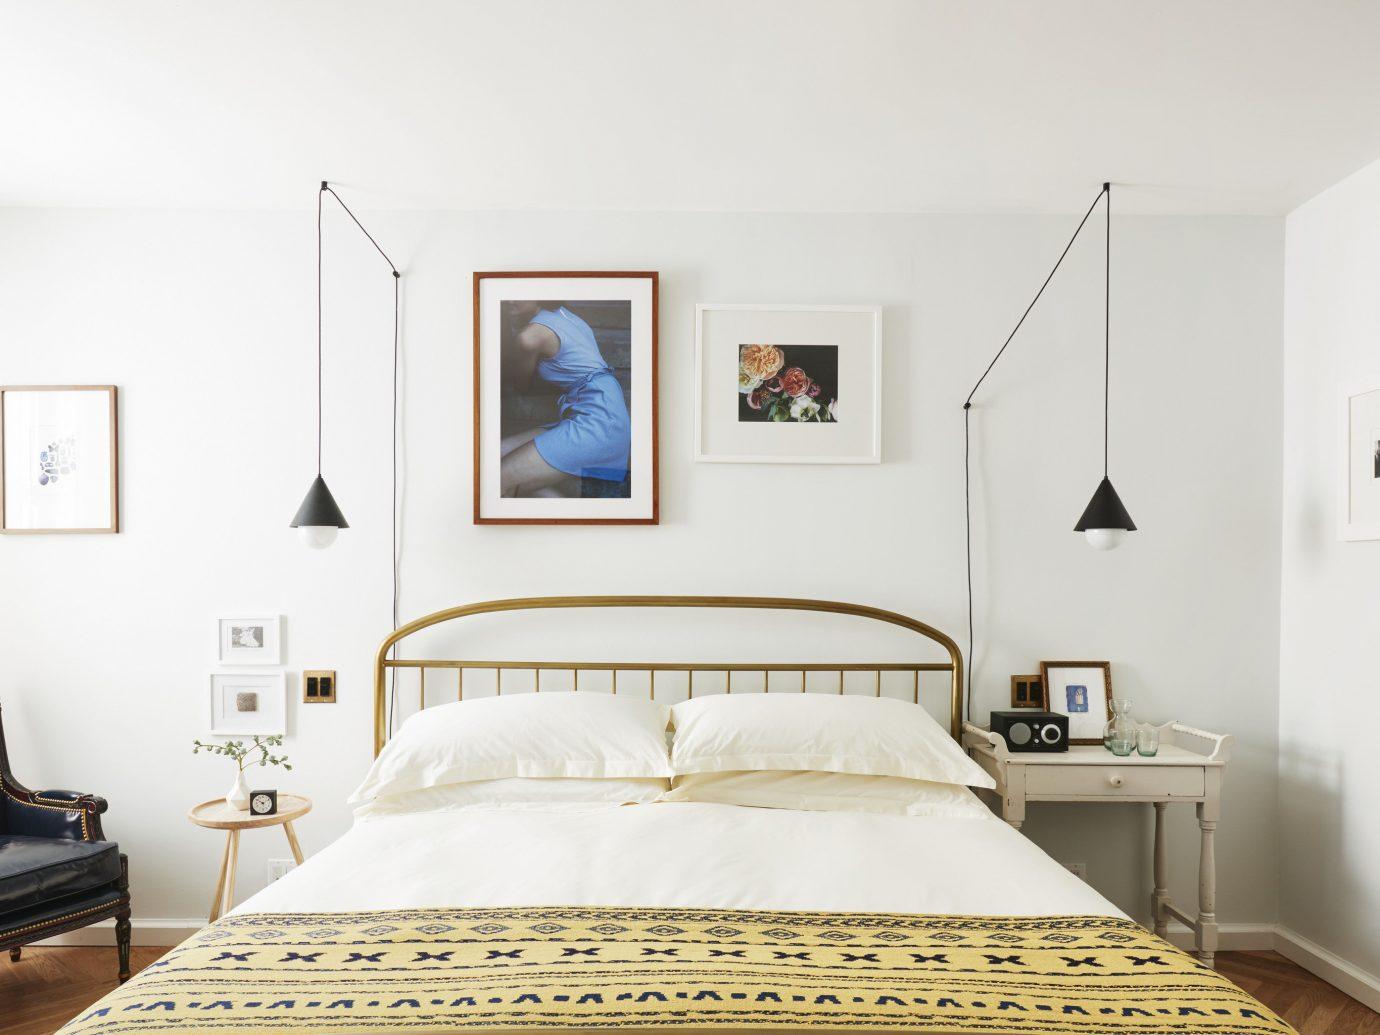 Editors Picks Luxury Travel Trip Ideas wall indoor bed room bed frame Bedroom interior design furniture scene Suite home floor real estate ceiling interior designer mattress decorated painting